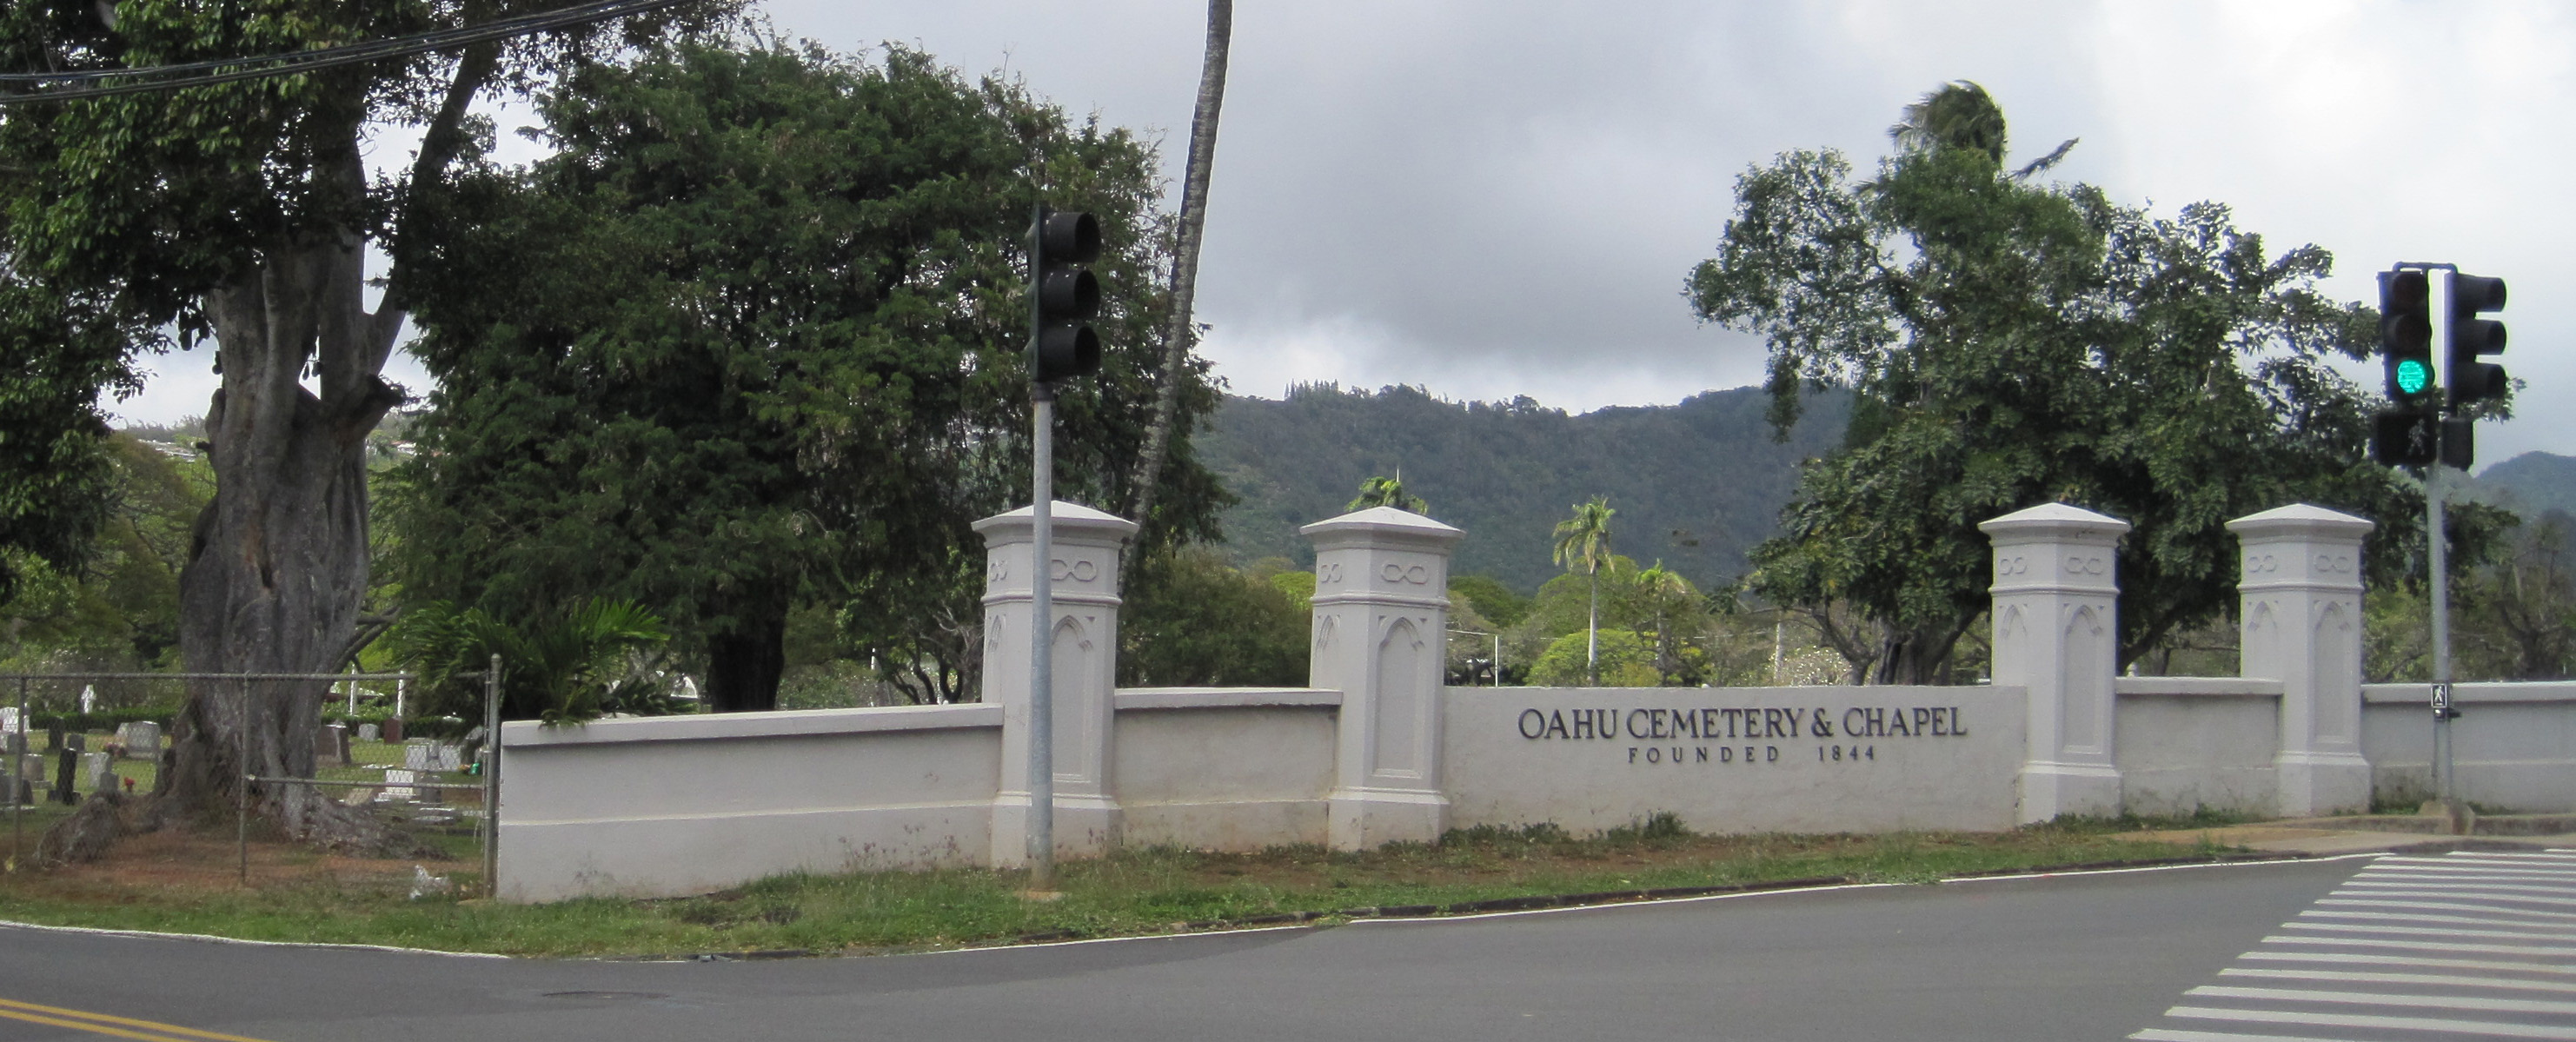 7133799e92 Oahu Cemetery - Wikipedia